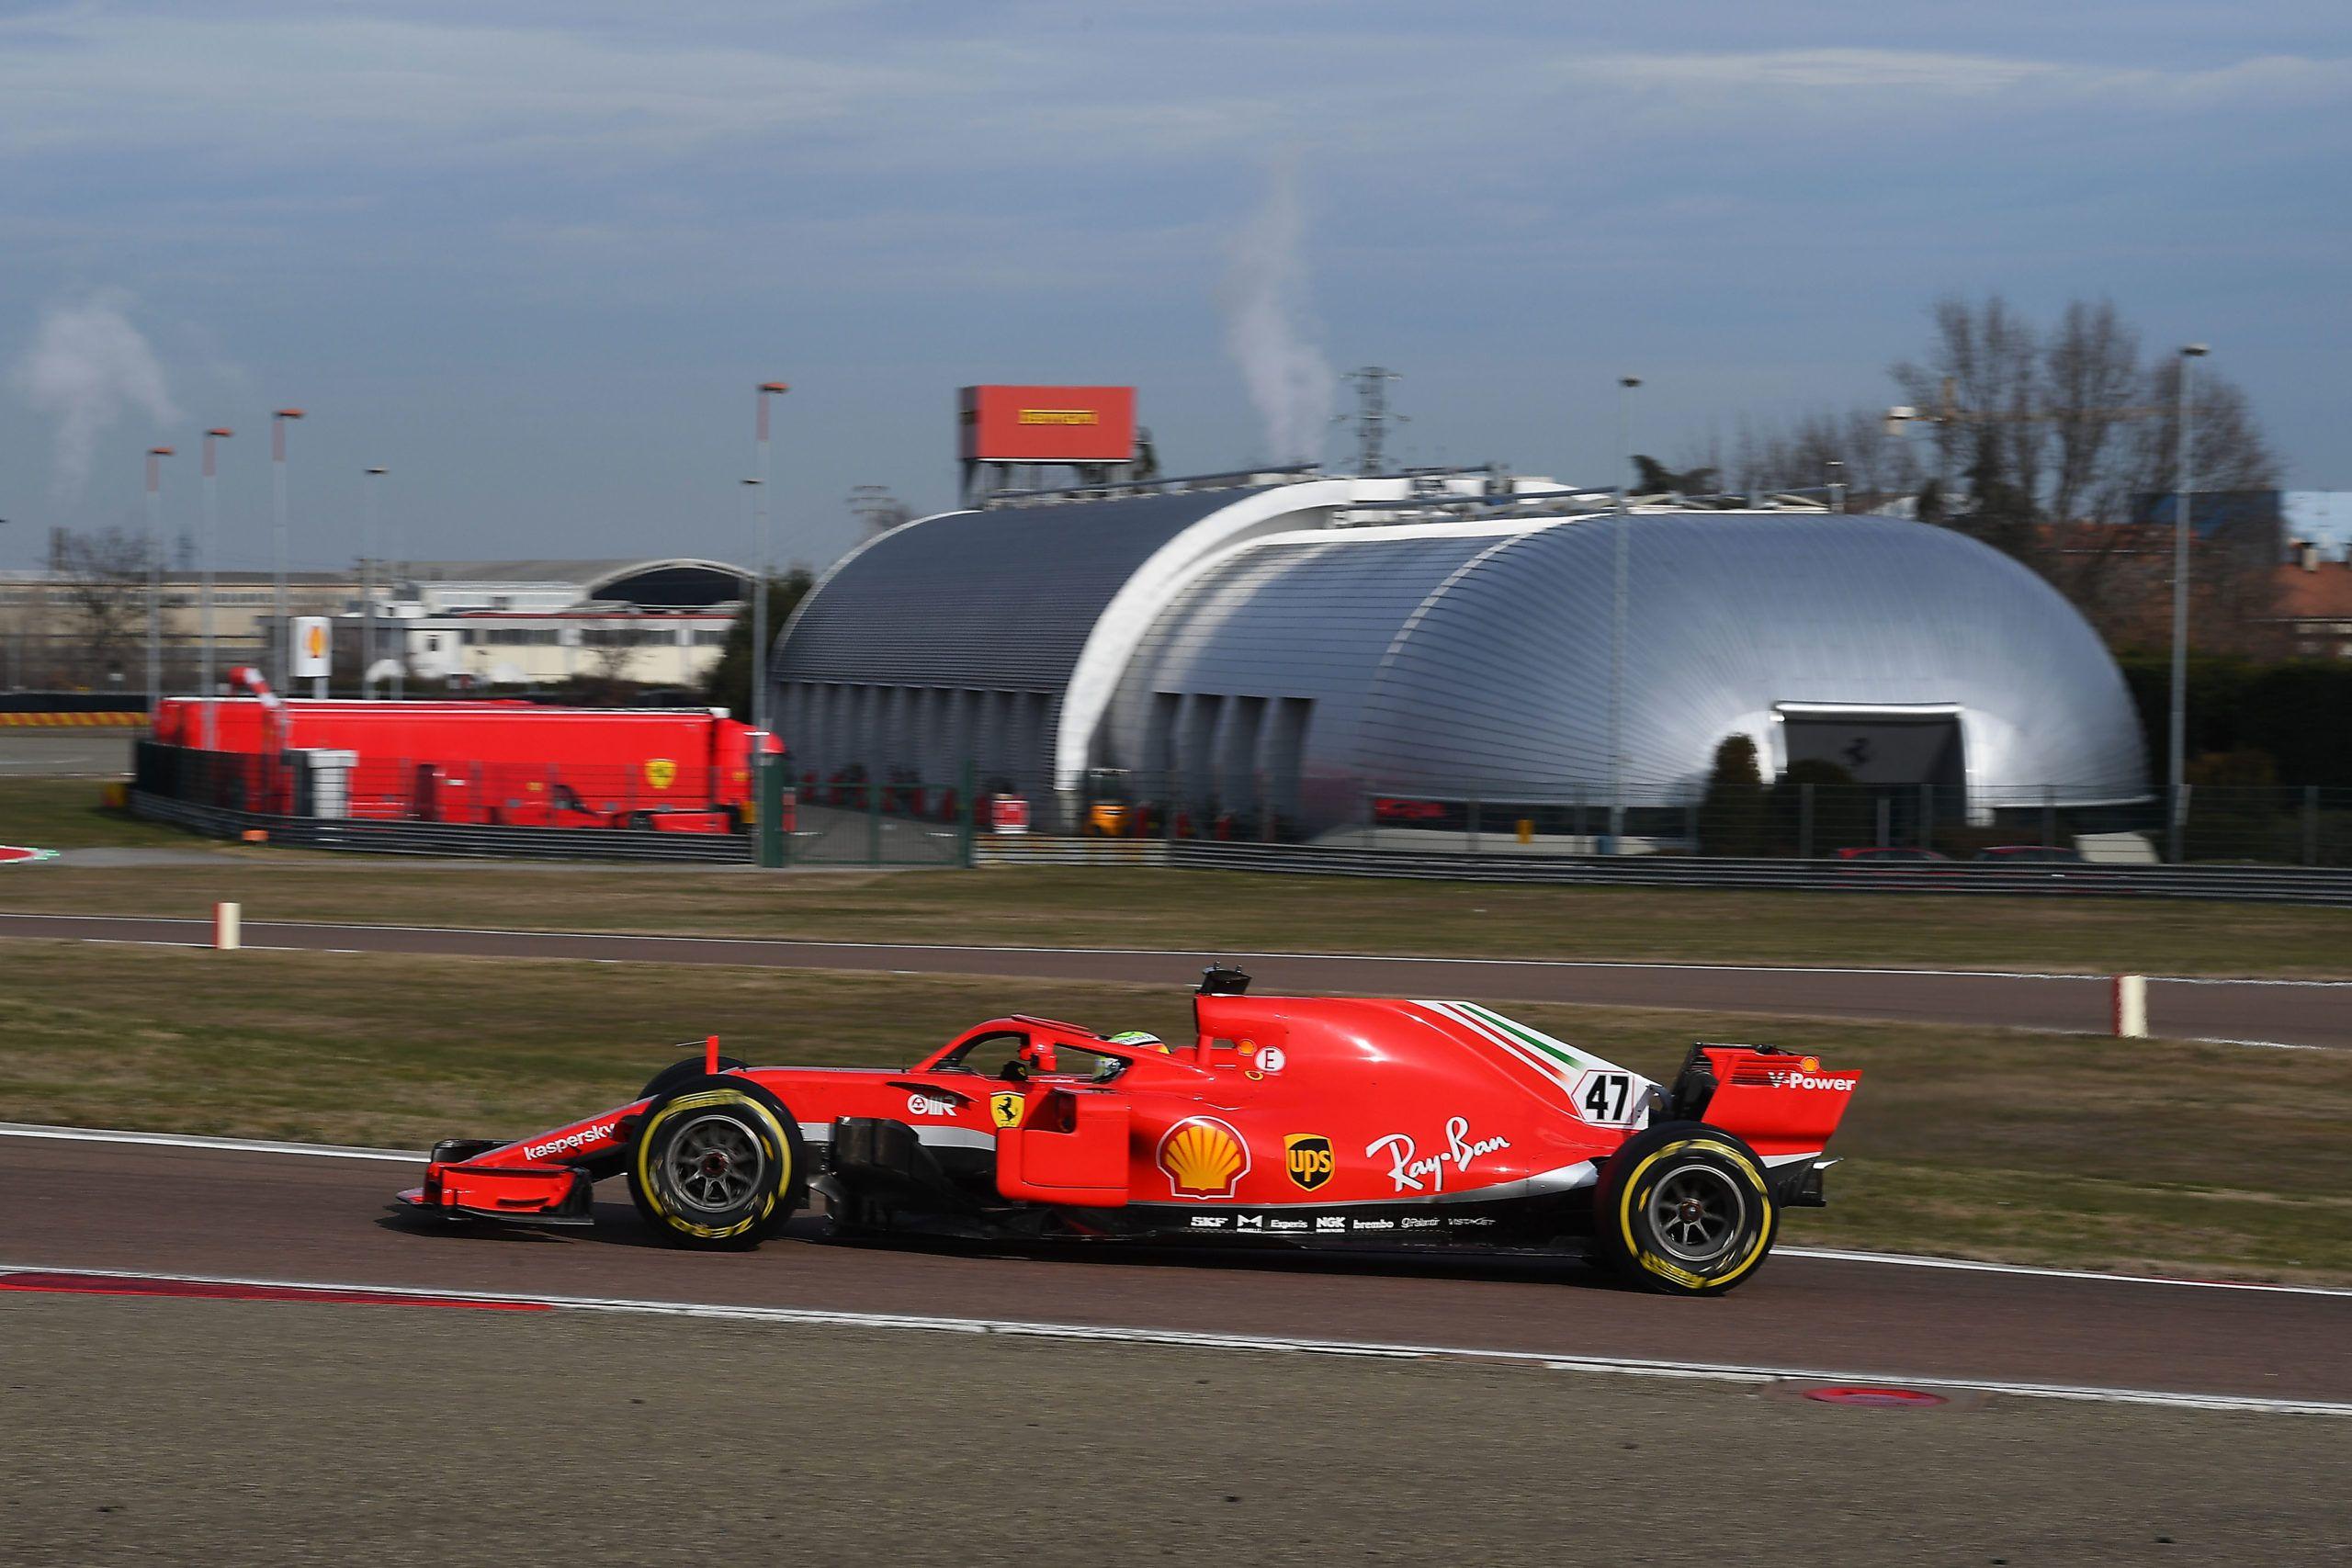 F1, Mick Schumacher, Red Bull